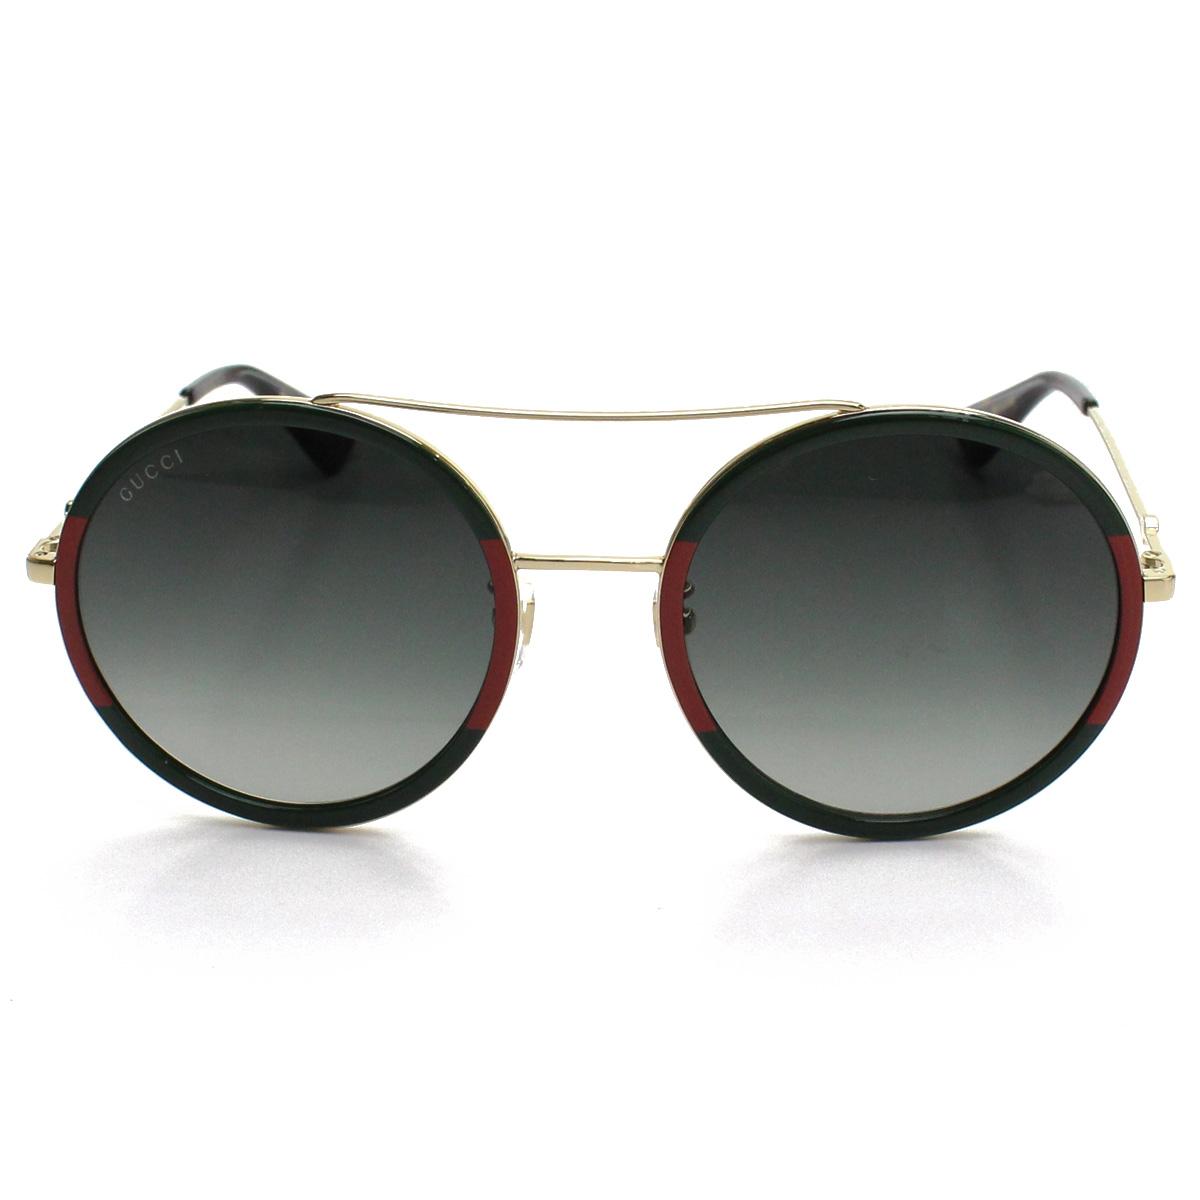 Men of Gucci GUCCI Bumble Bee round sunglasses GG0061S 003 Green line